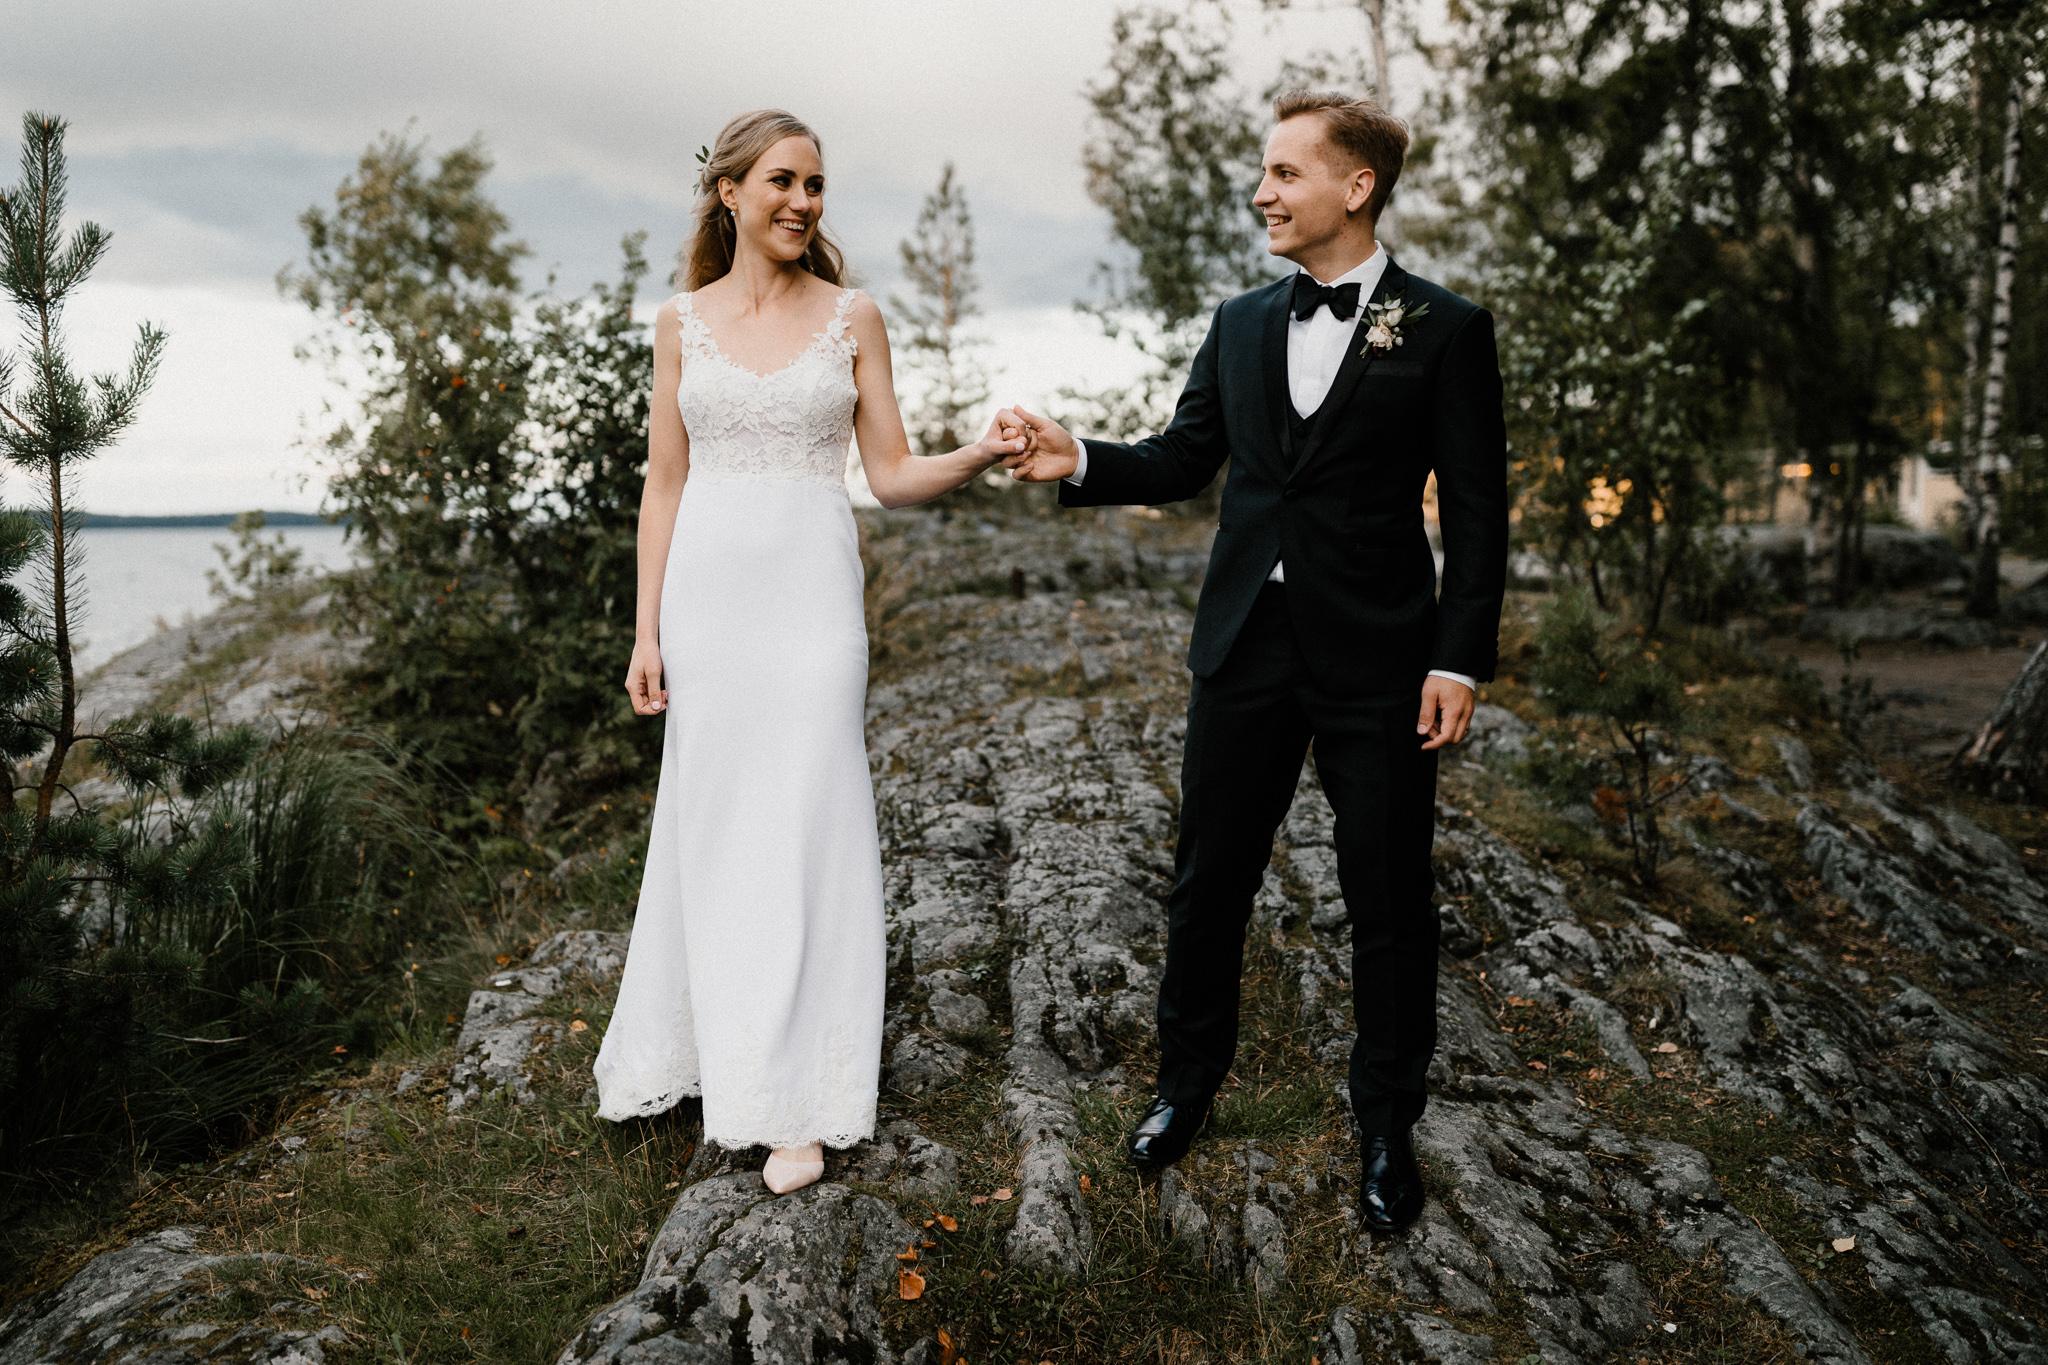 Johanna + Mikko - Tampere - Photo by Patrick Karkkolainen Wedding Photographer-149.jpg